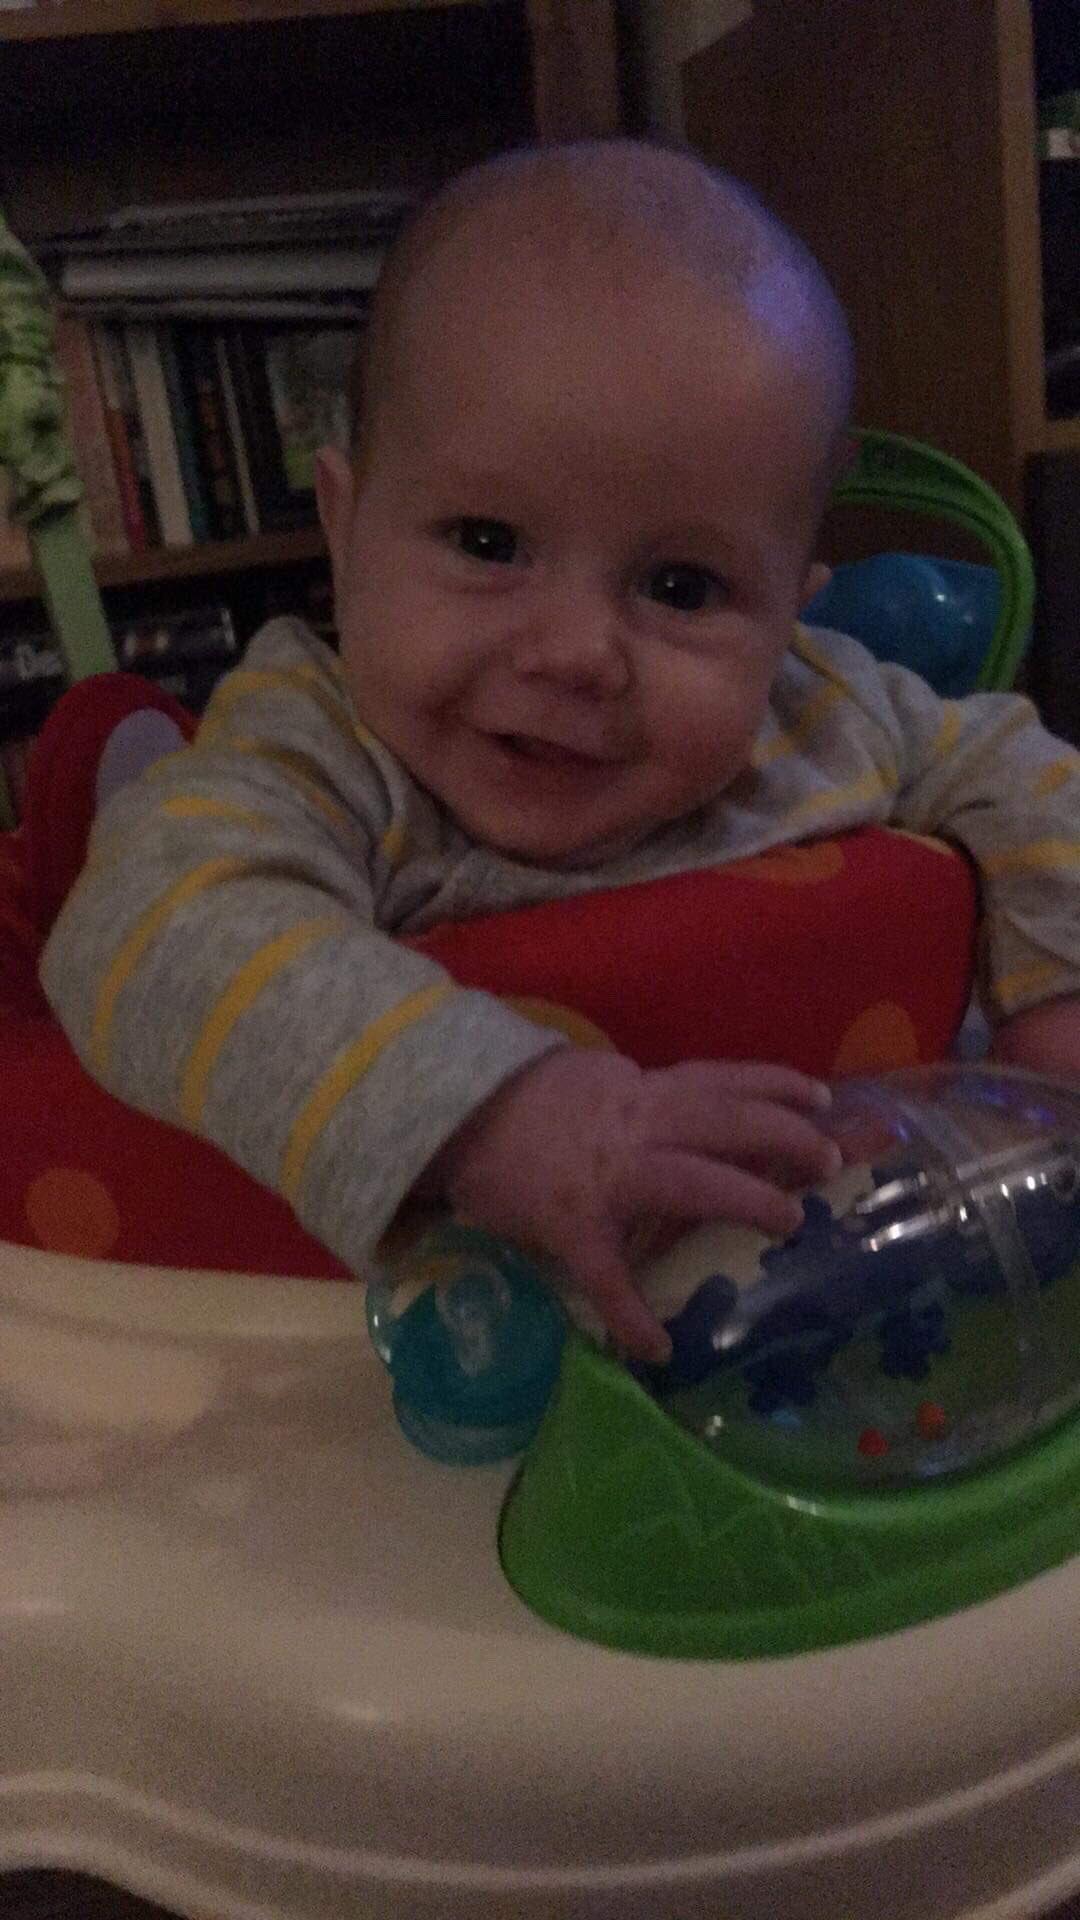 Happy birthday Eamonn Holmes, love from my little Éamonn!